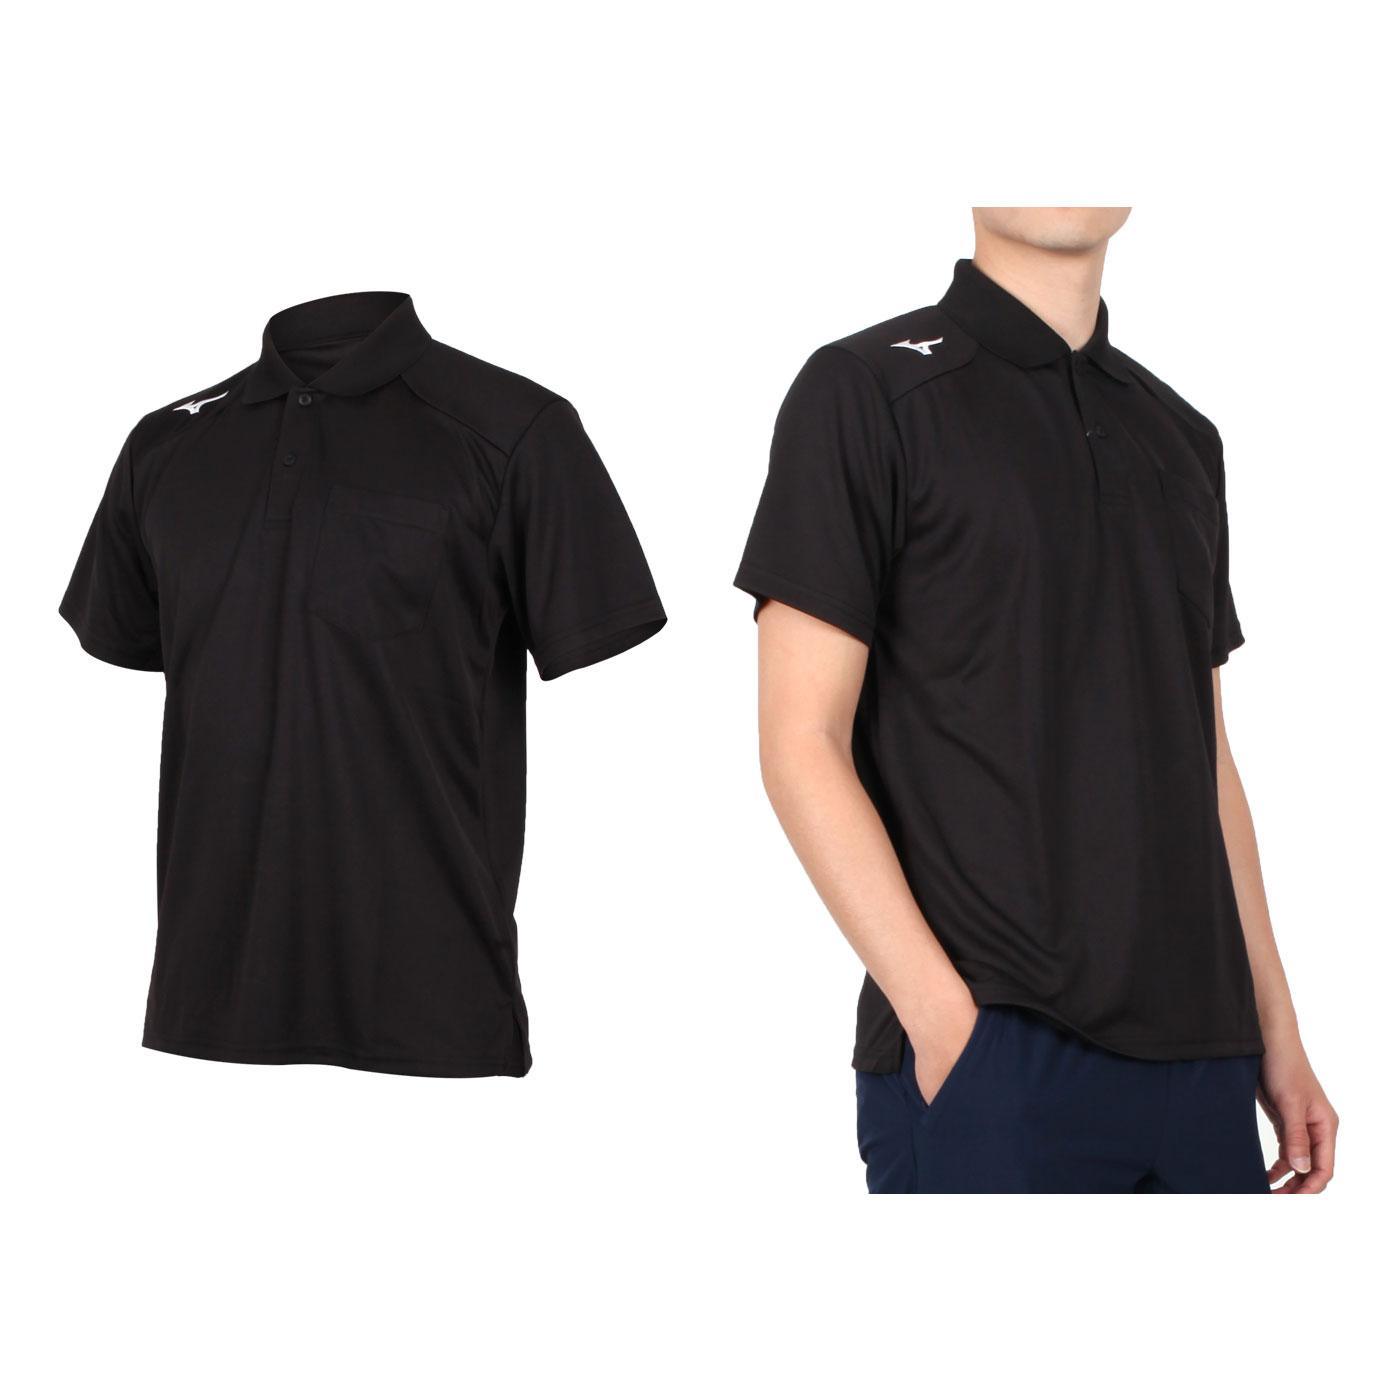 MIZUNO 男款短袖POLO衫 32TA002001 - 黑白